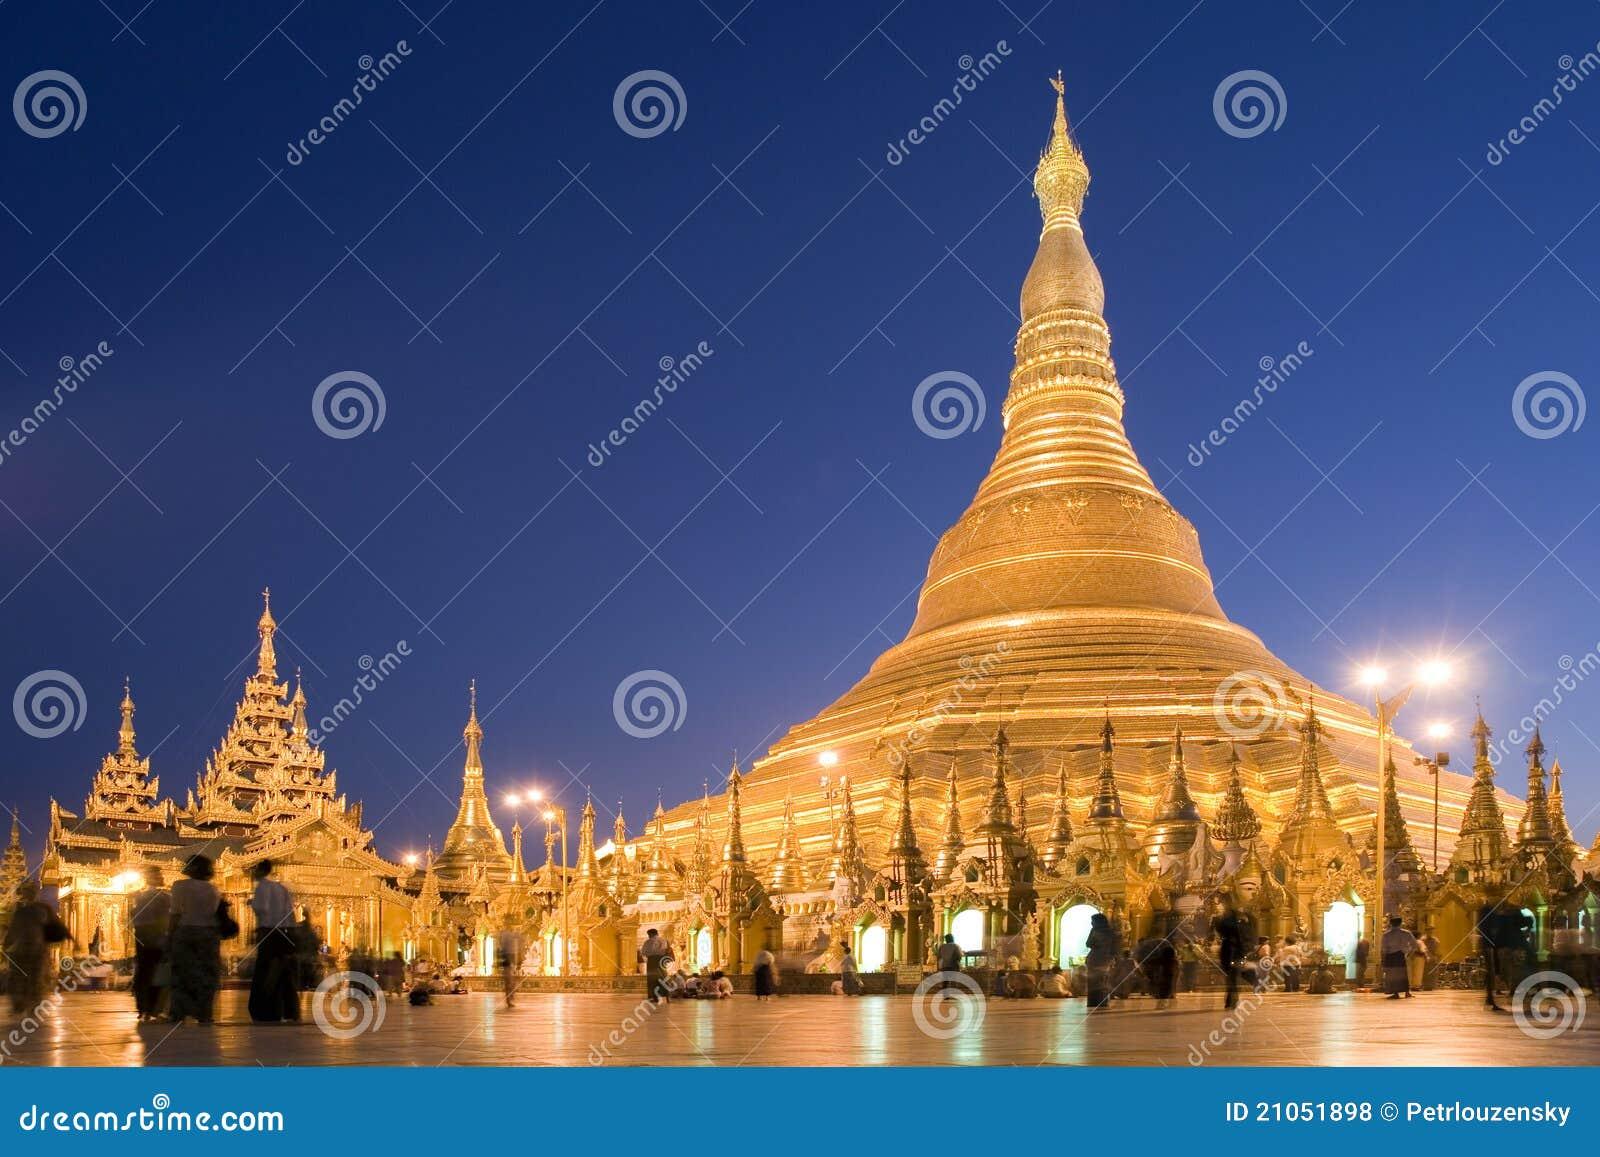 Pagoda de Shwedagon à Yangon, Myanmar (Birmanie)